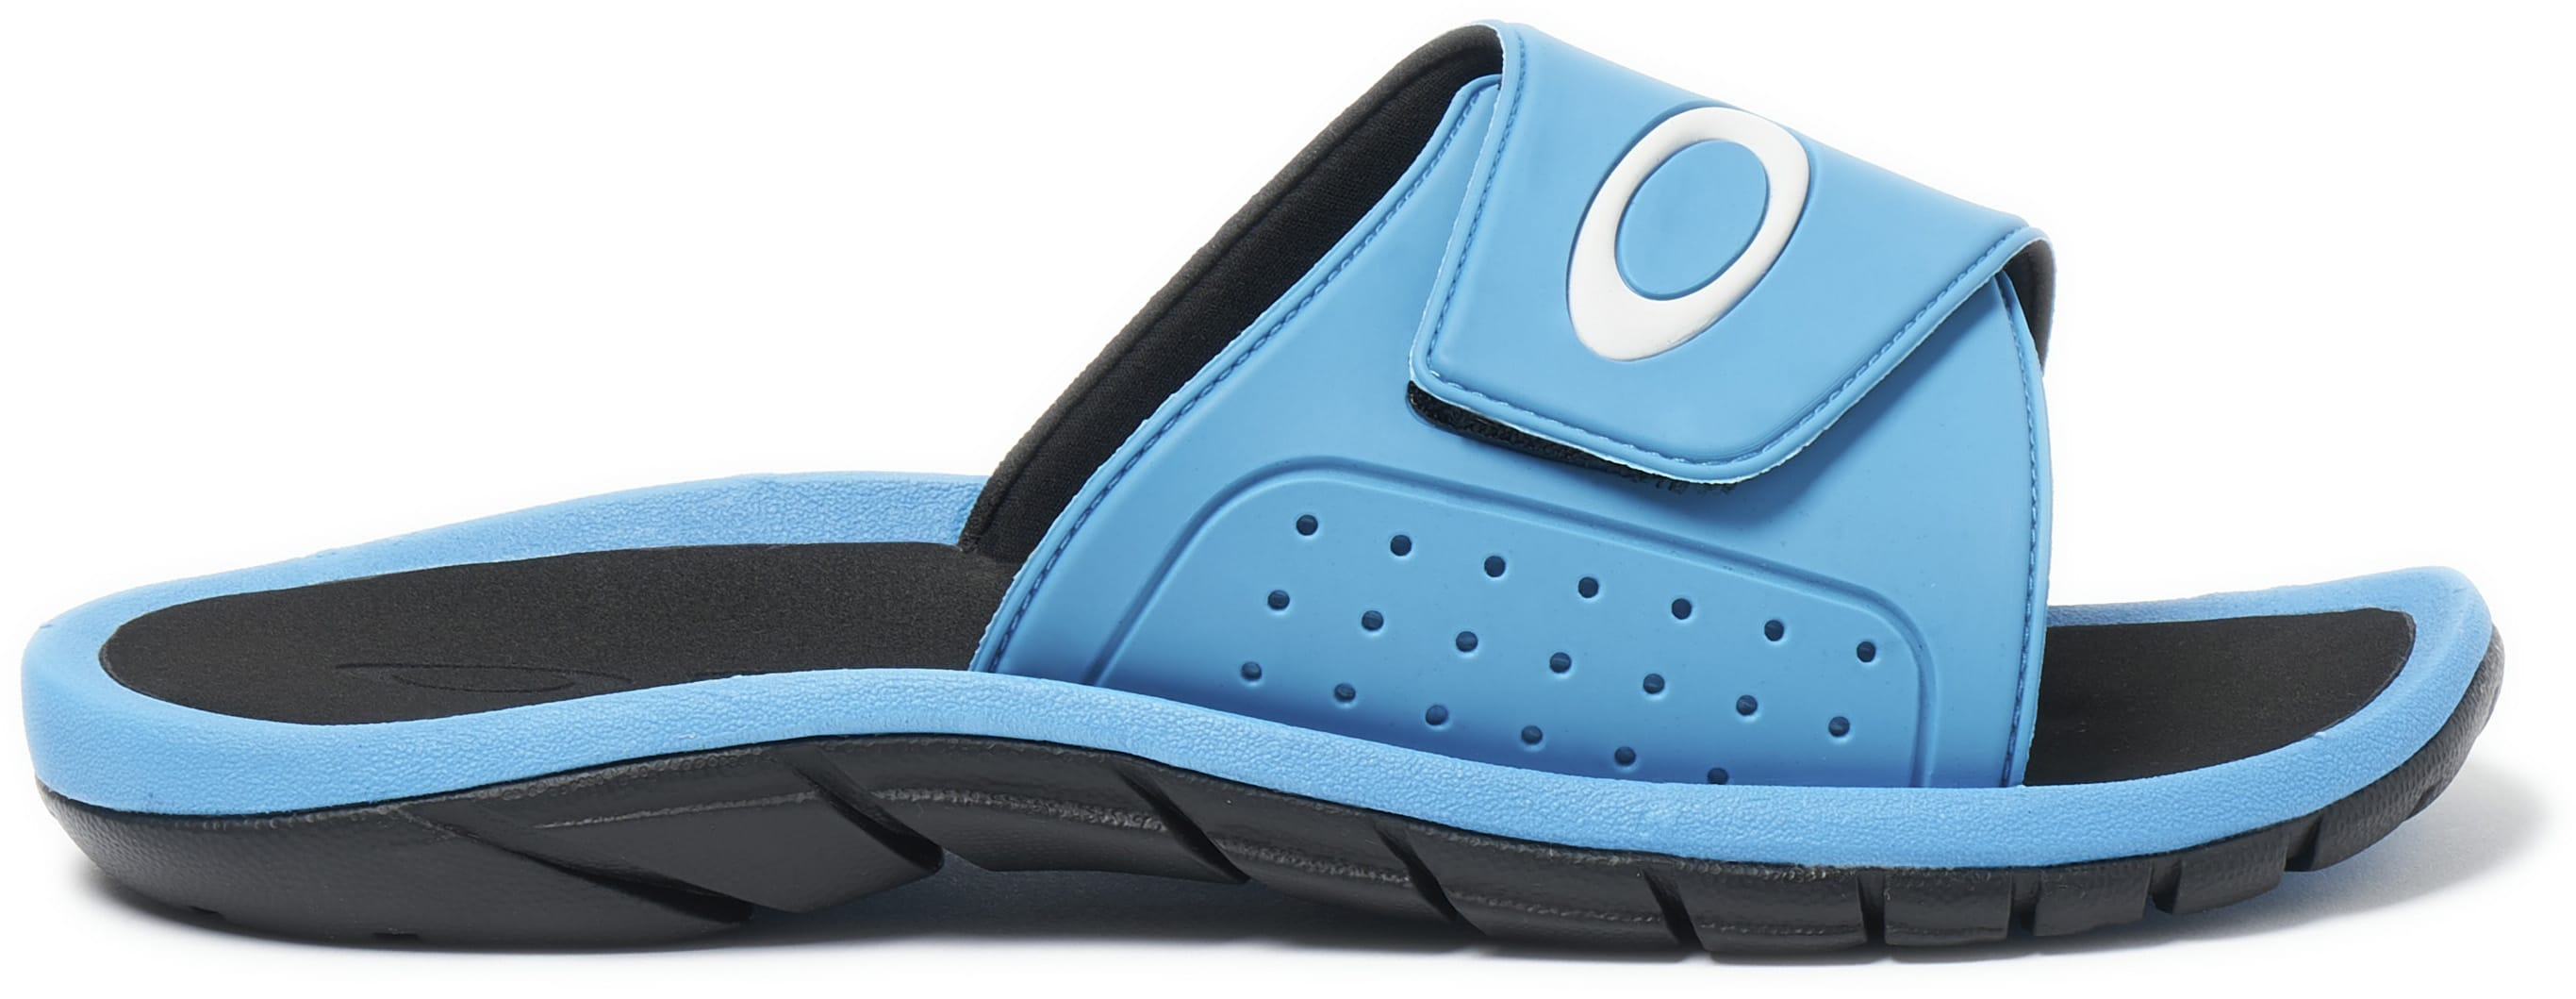 06921382014 Oakley Super Coil Slide 2.5 Sandals - thumbnail 3